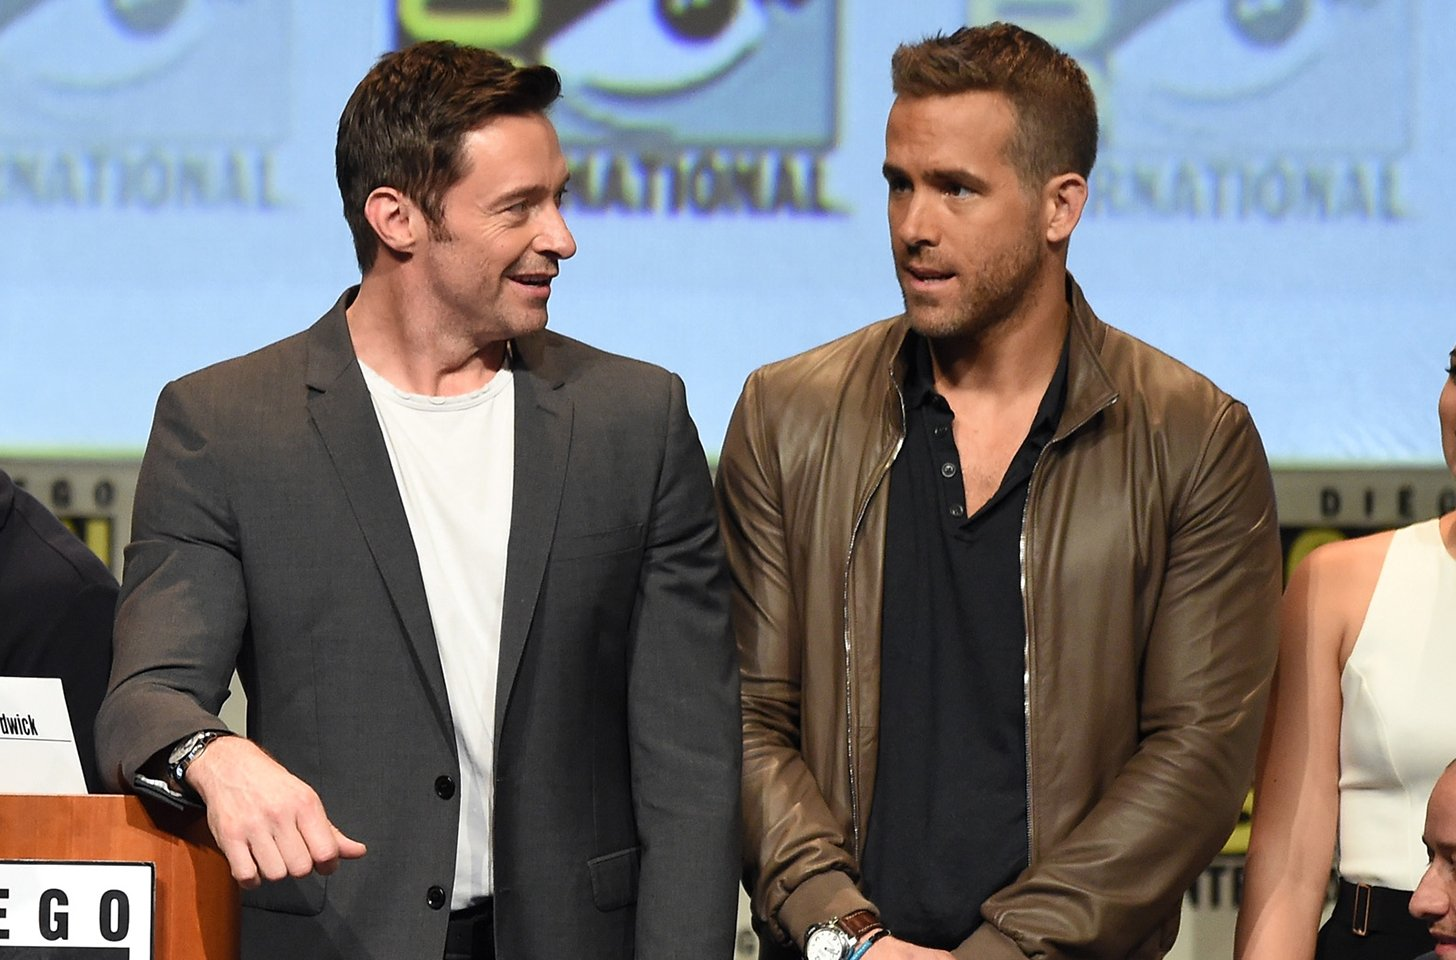 Hugh Jackman Throws Shade At Ryan Reynolds (Again) While Praising Blake Lively